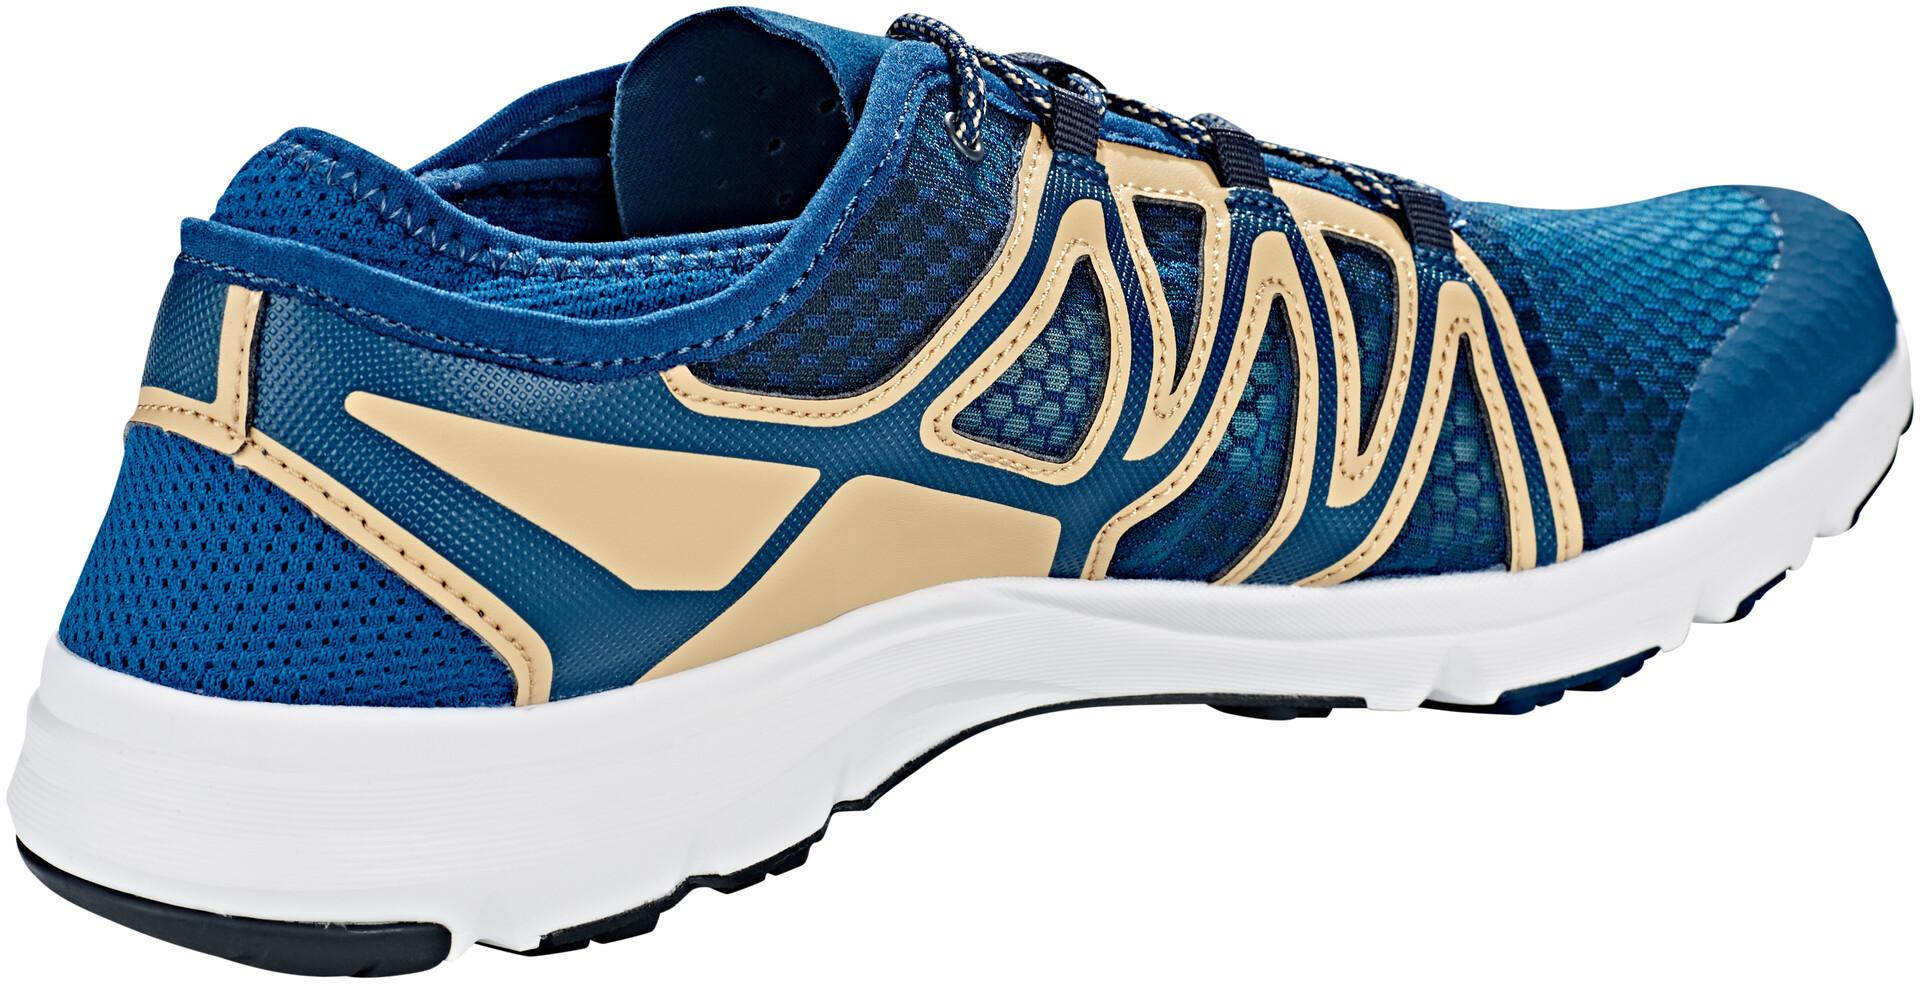 Salomon Crossamphibian Swift 2 Shoes Herren poseidontaos taupeebony